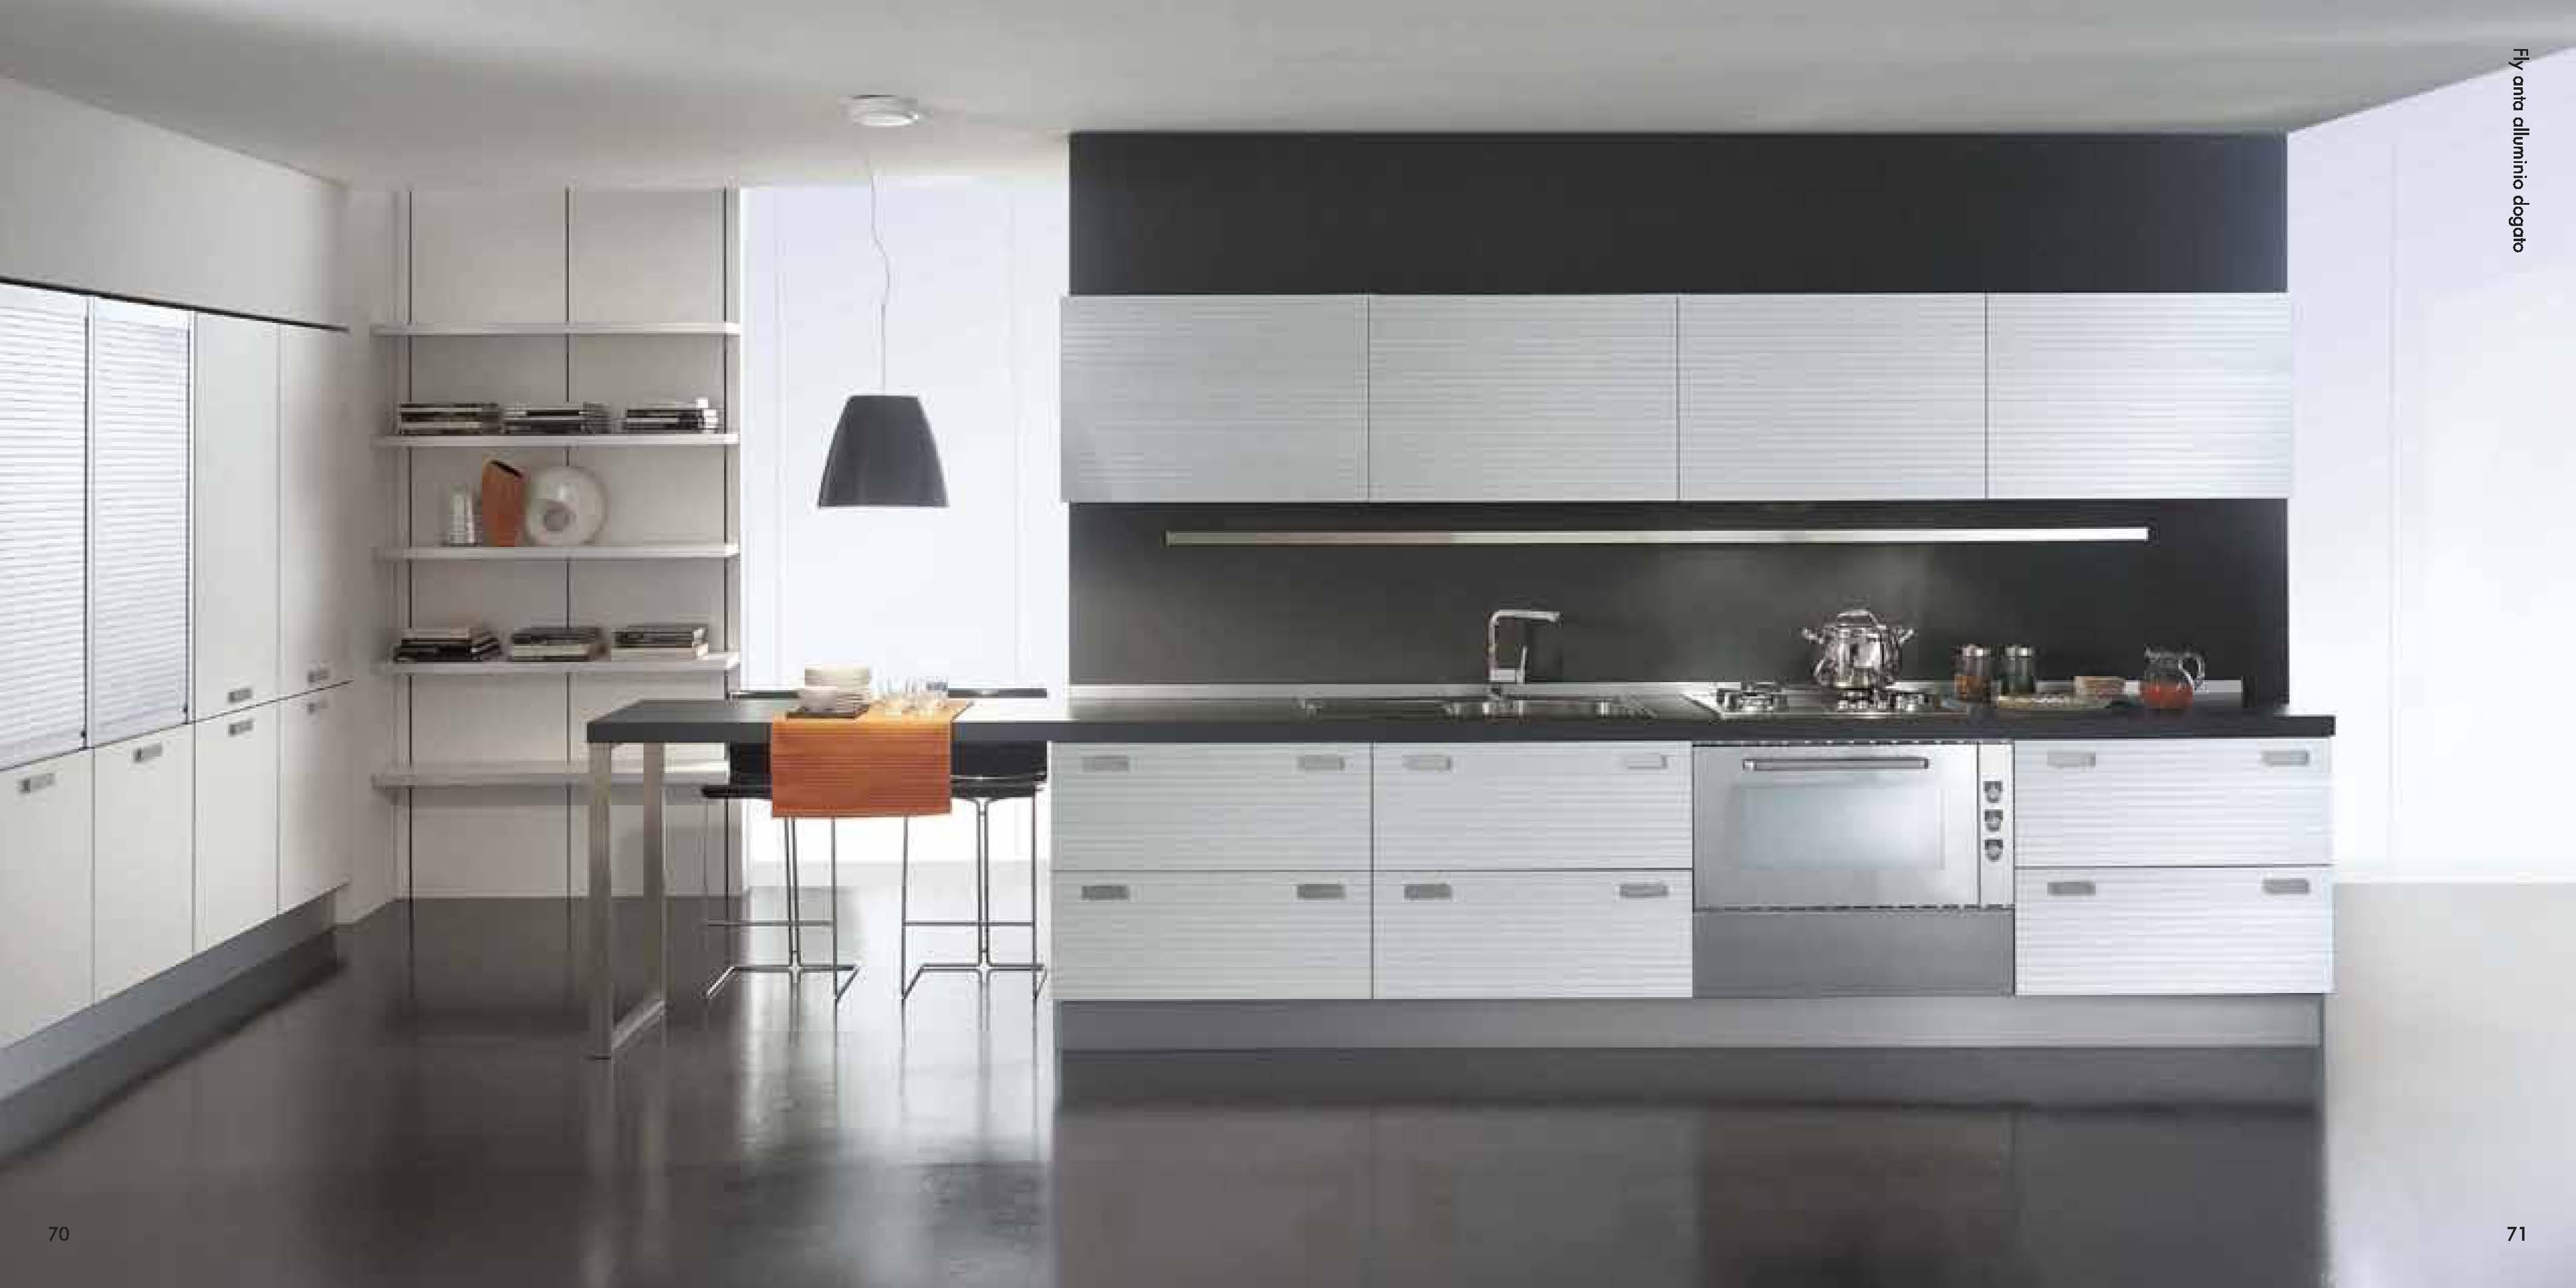 Arredamento cucina lombardia provincia di como for Arredo cucina design